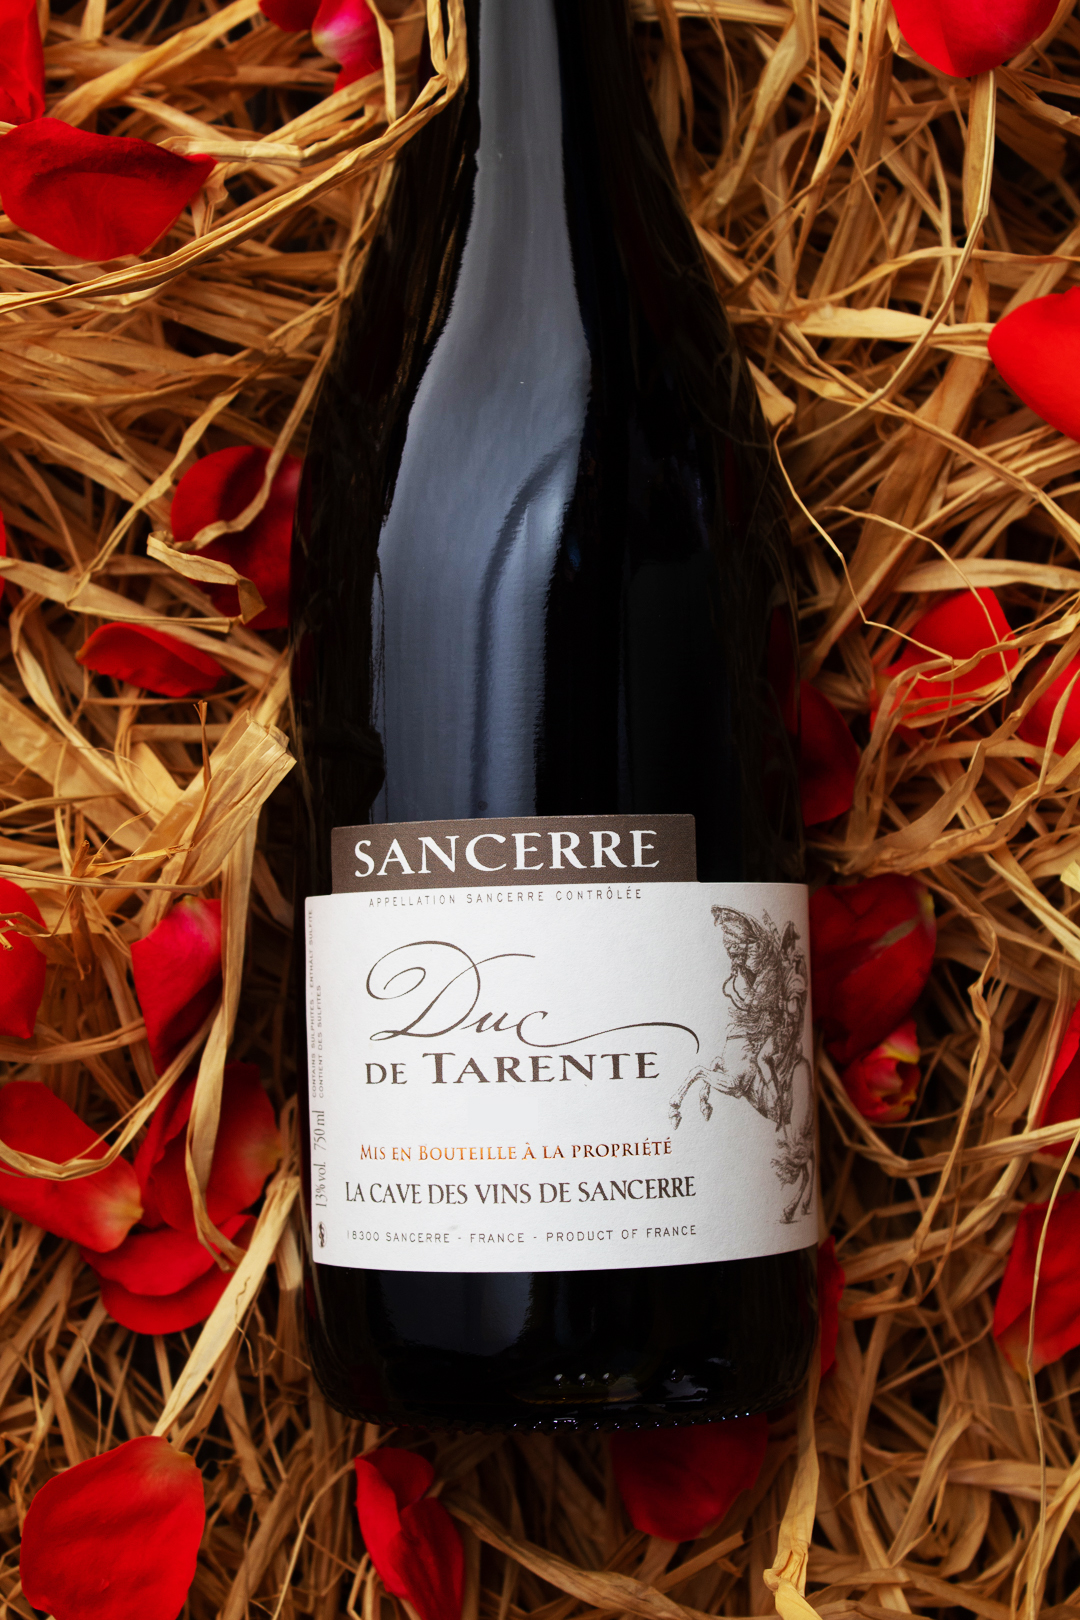 Sancerre Rouge AOC 2018 - Duc de Tarente